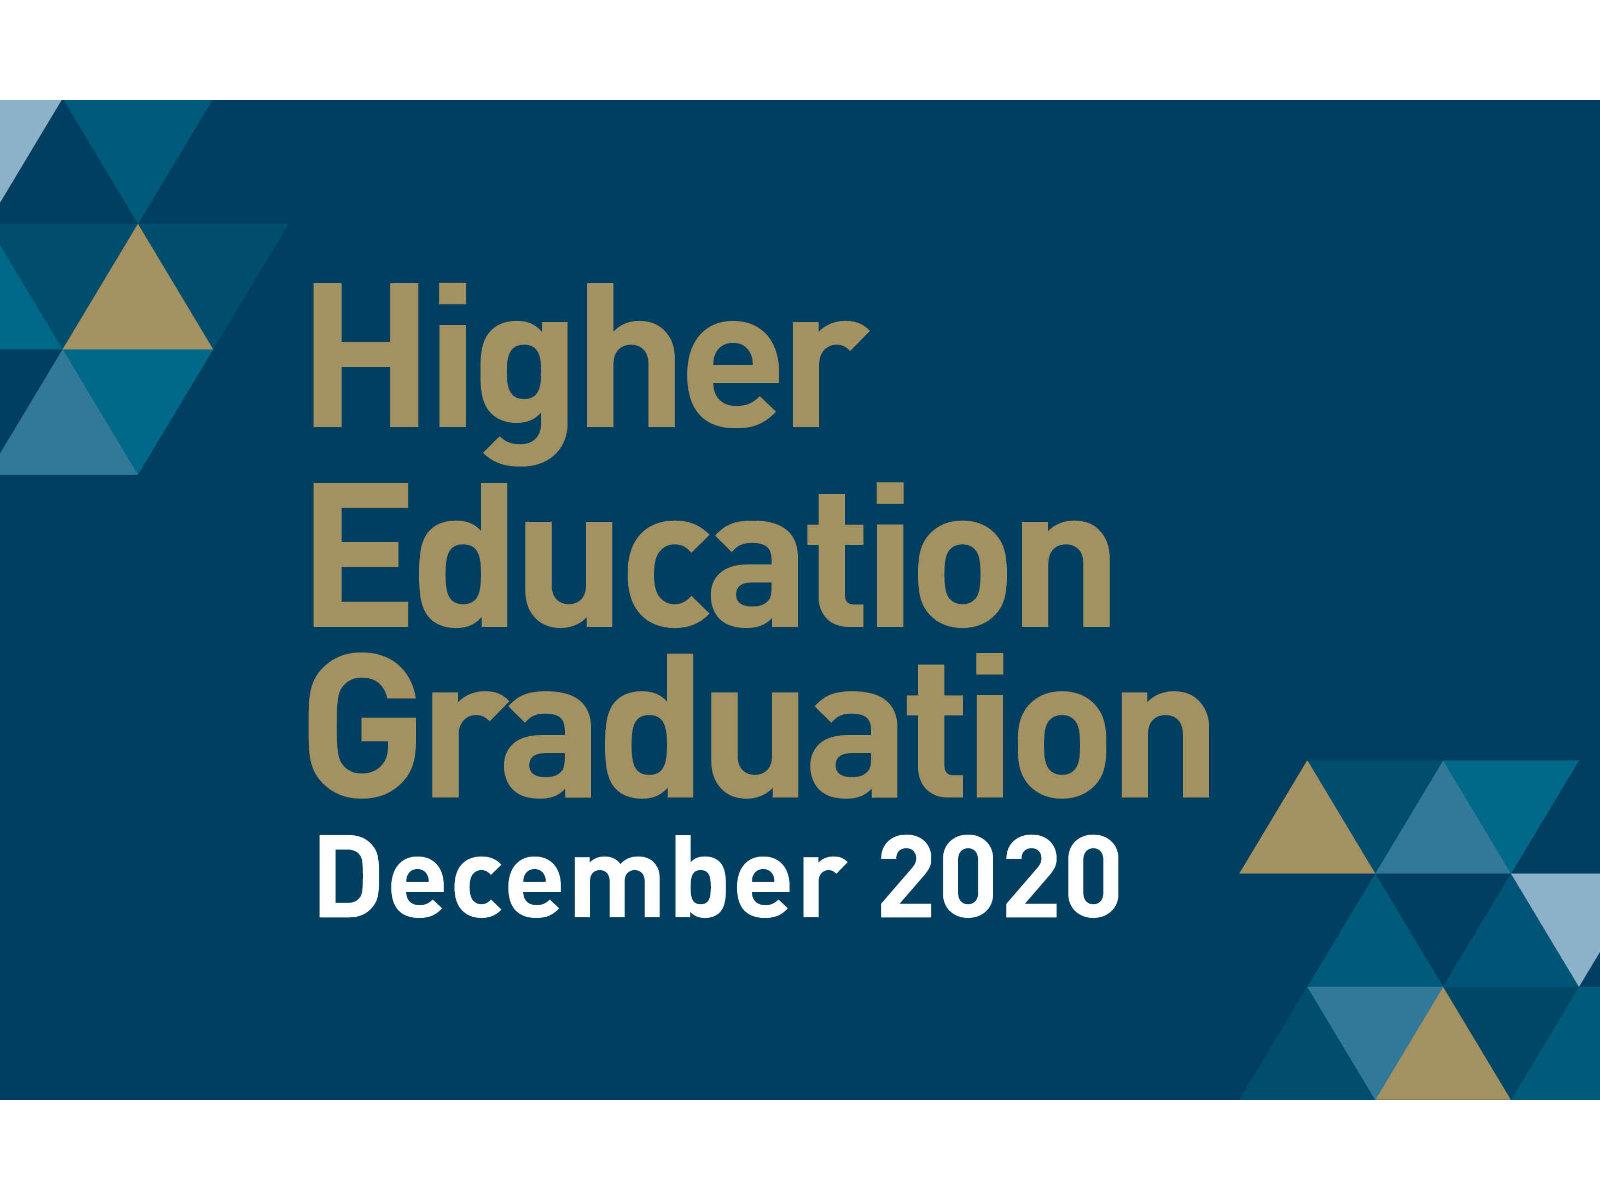 Higher Education Graduation - December 2020.